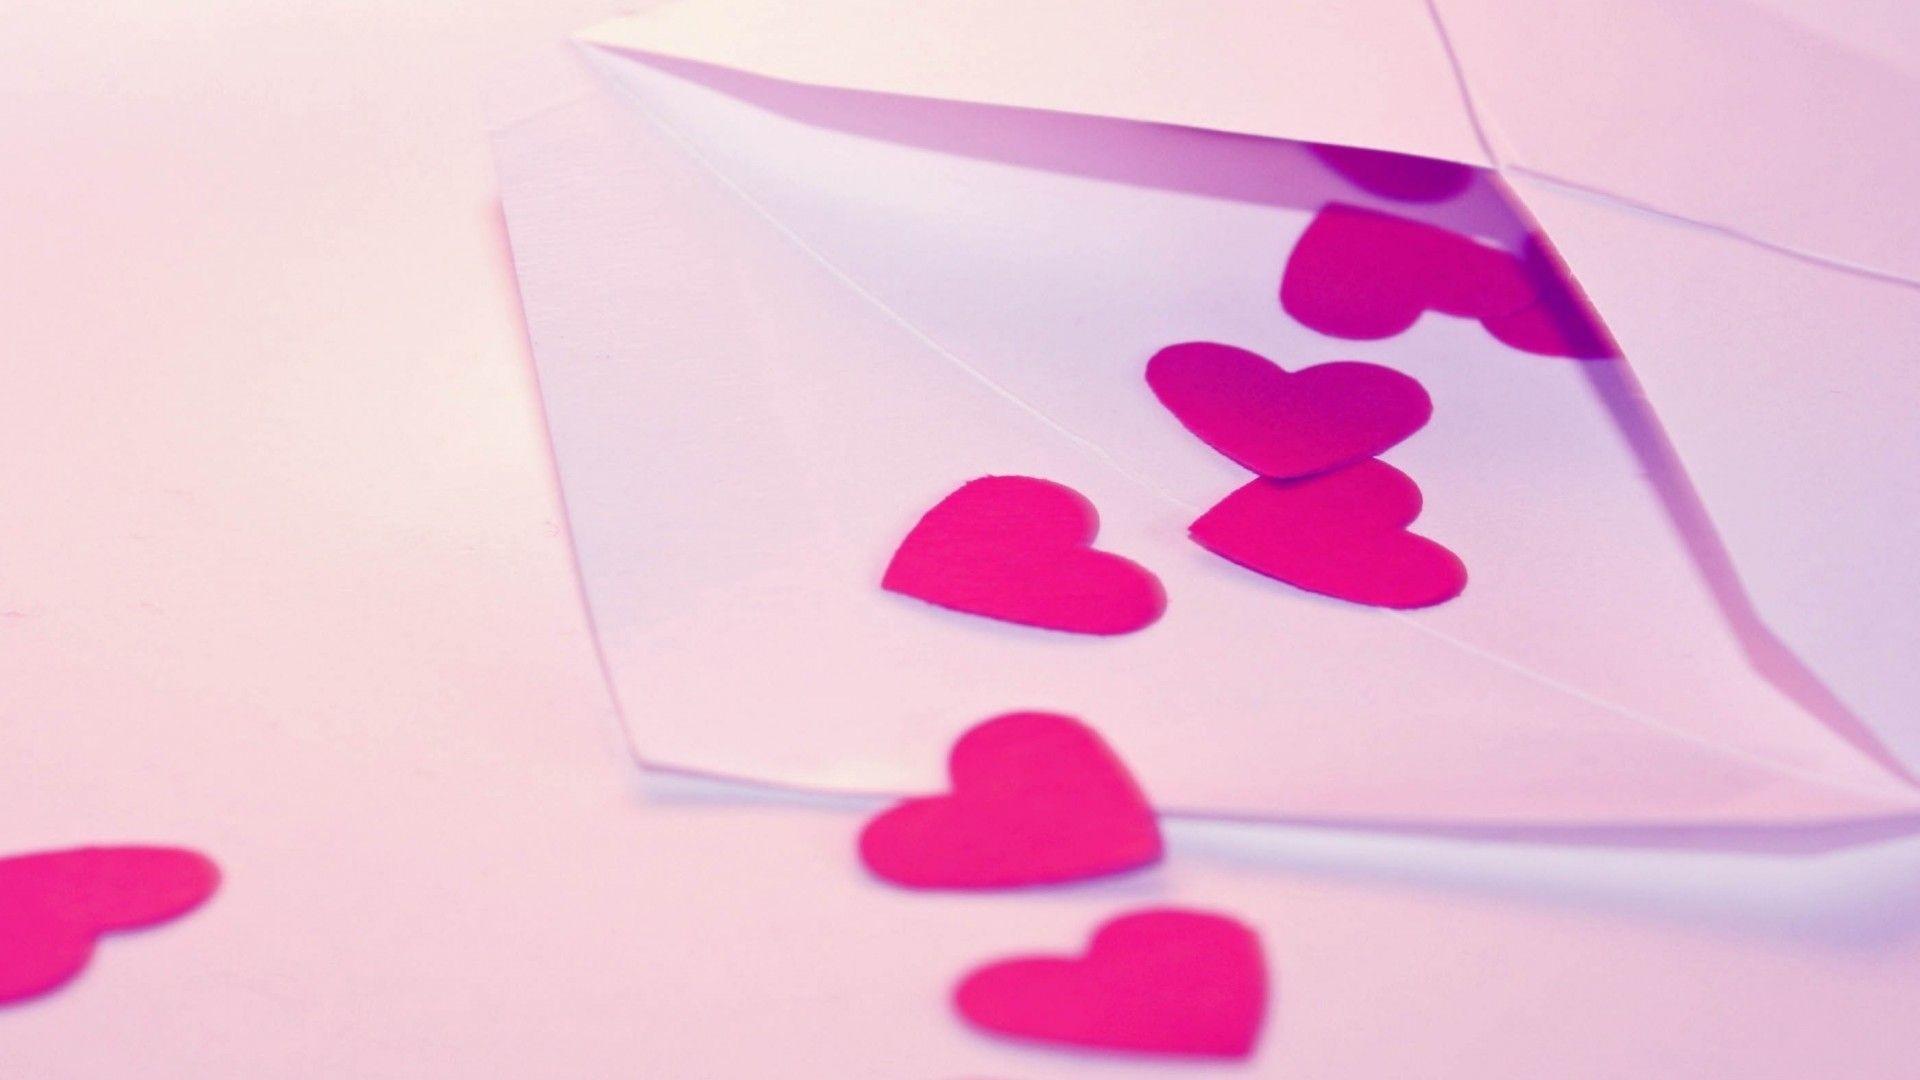 Cute-Love-Desktop-Wallpapers-Hearts.jpg